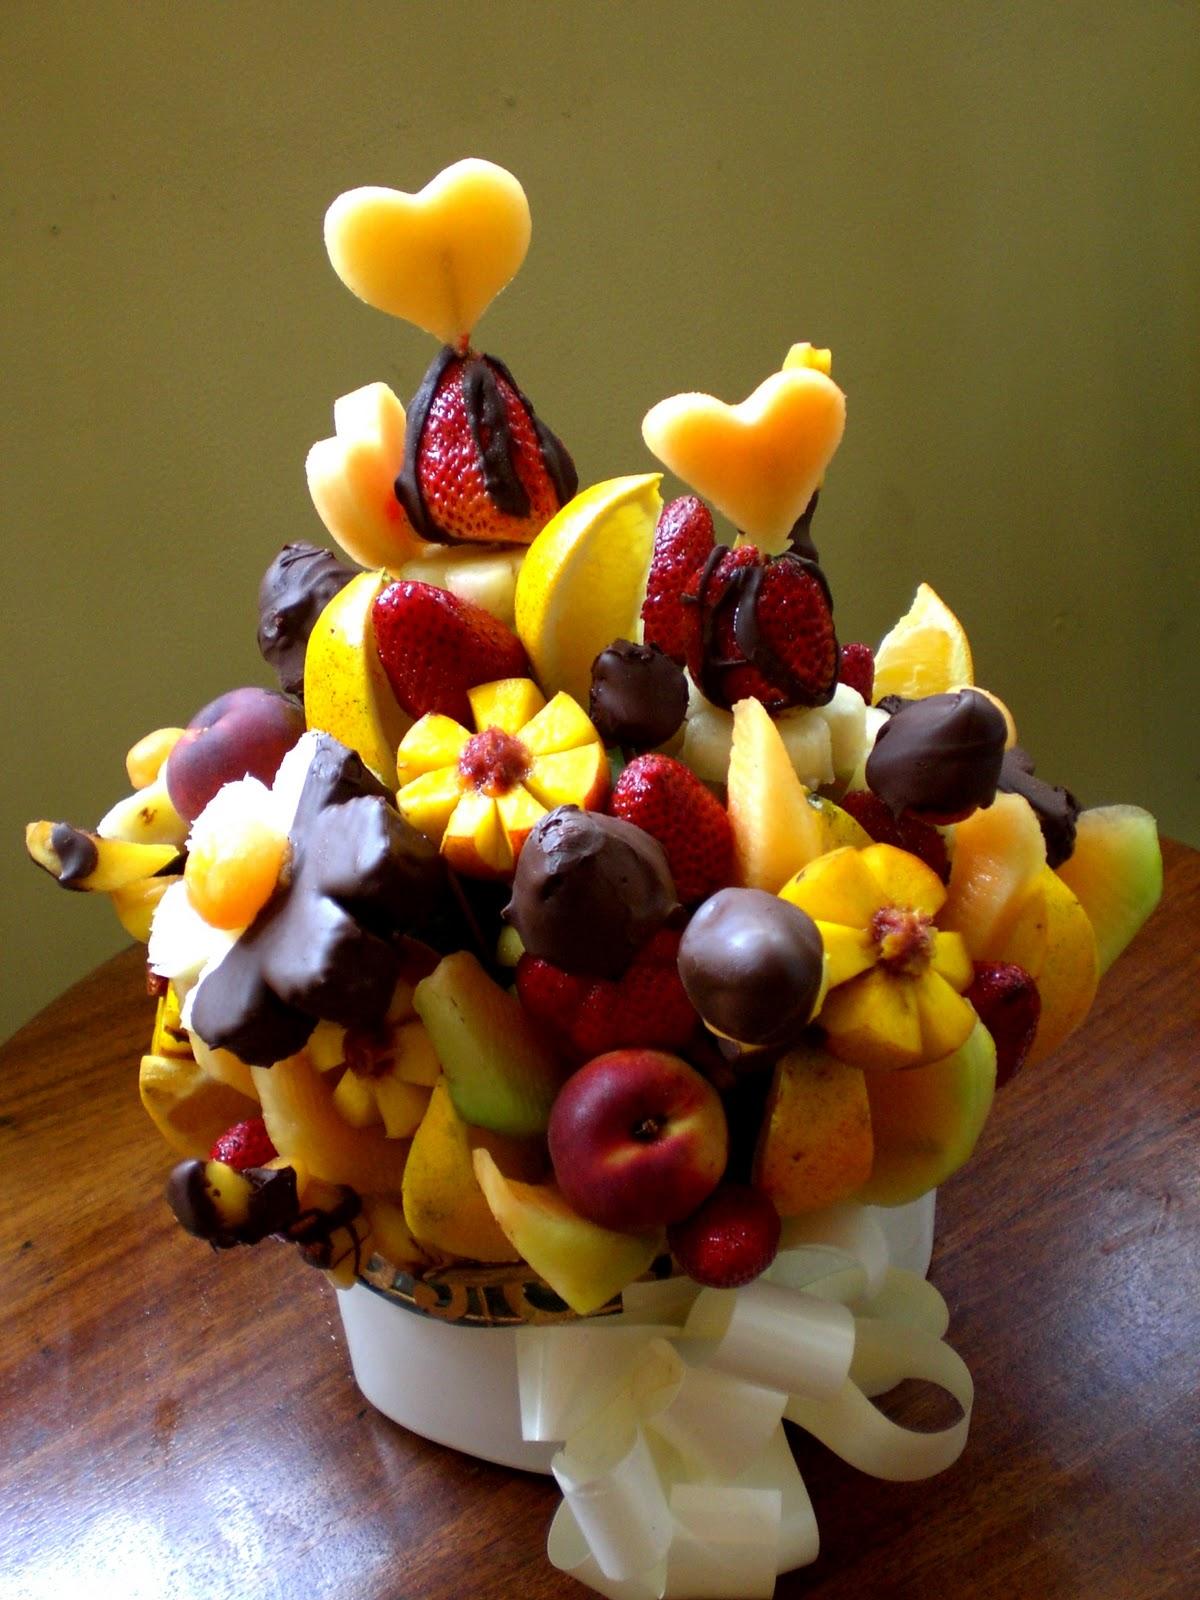 La dolce frutta frutas achocolatadas